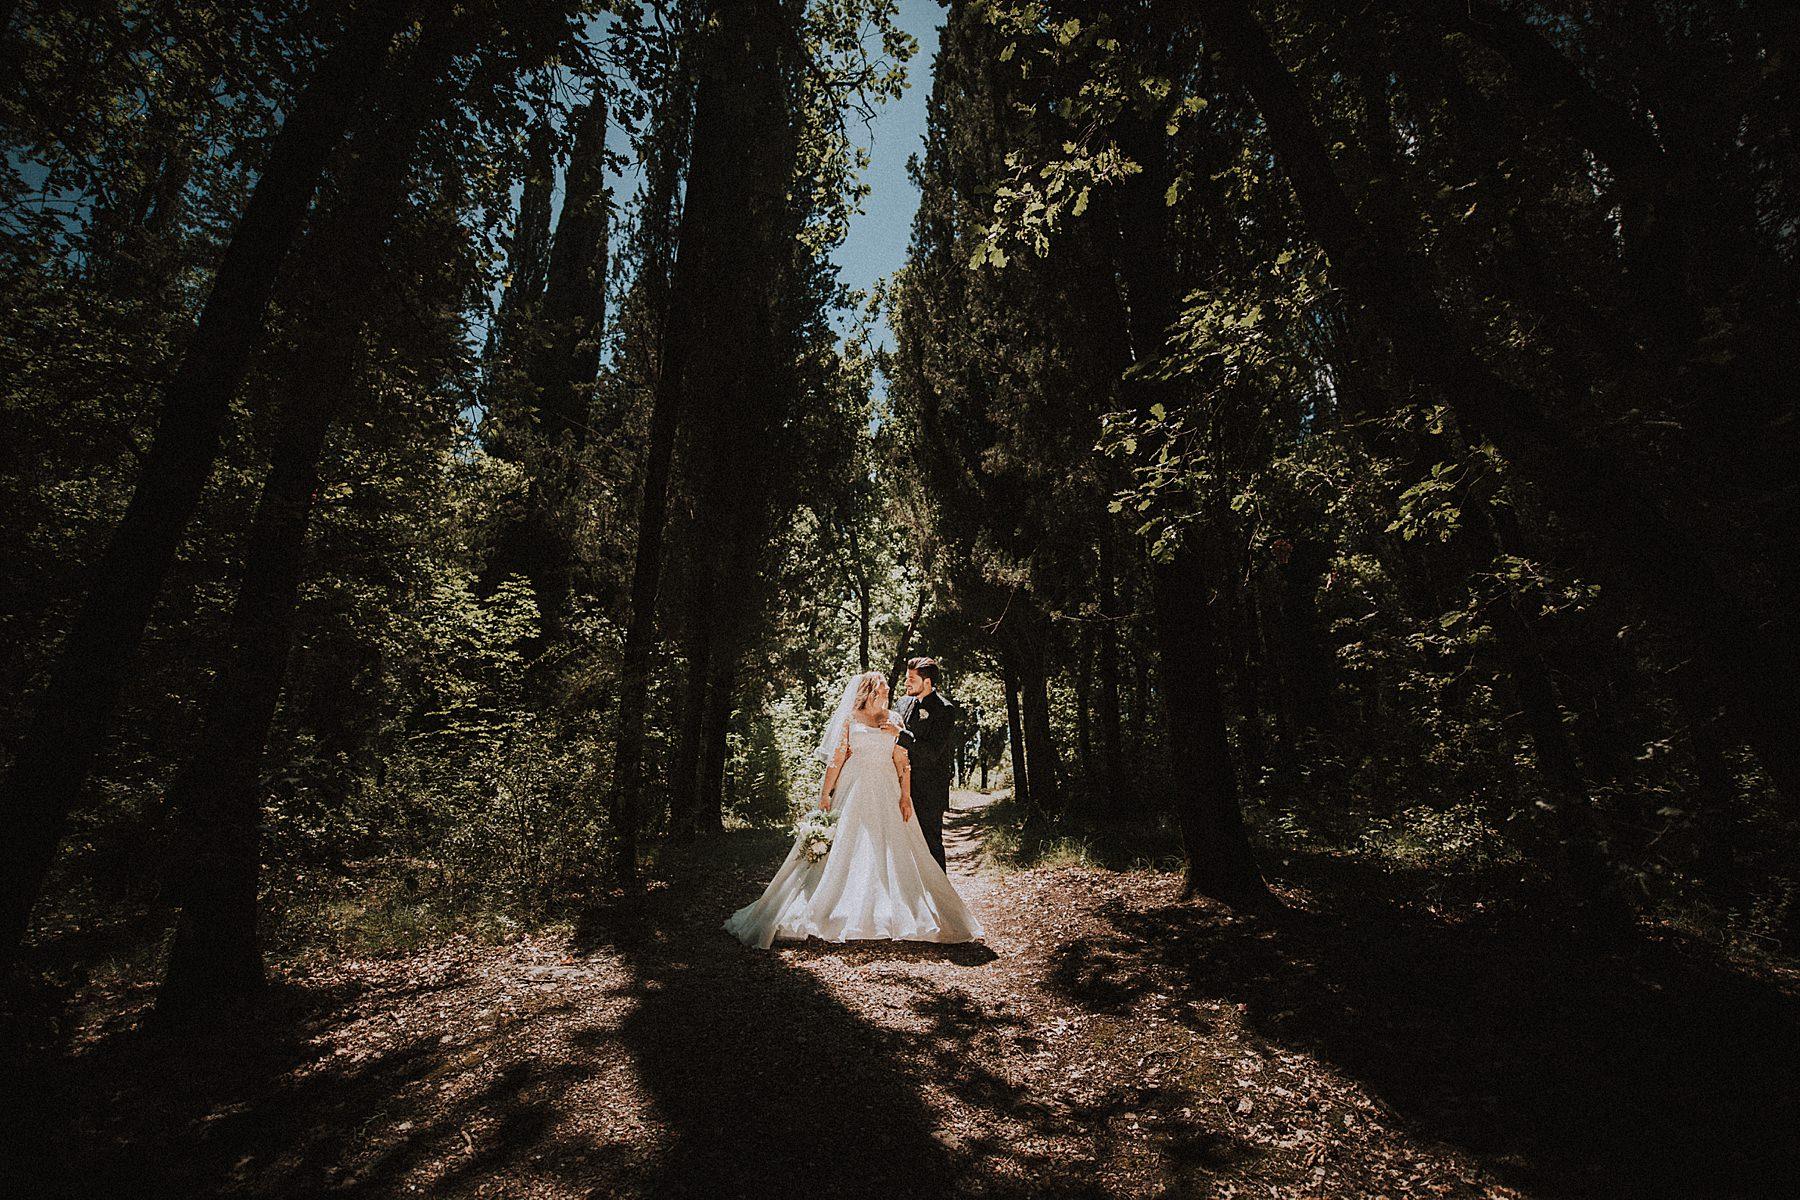 foto sposi nel bosco toscana